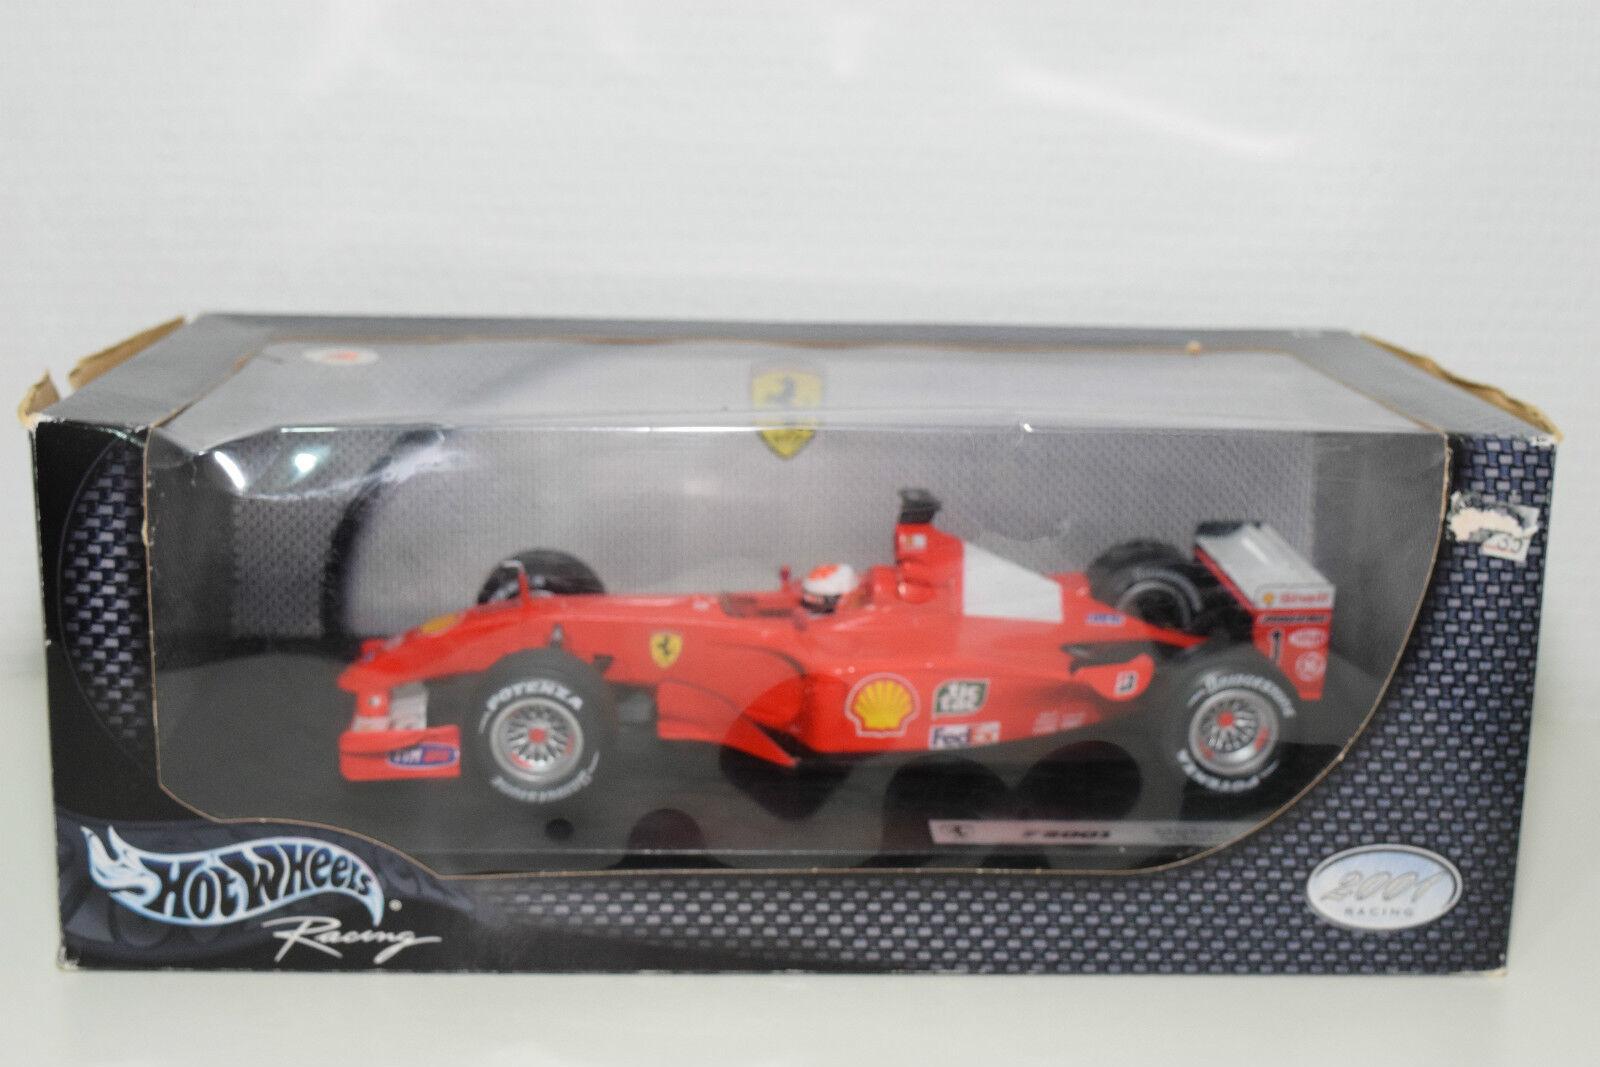 Hotwheels 50202 Ferrari F1 F2001 2001 Schumacher MINT BOXED RARE RARE RARO